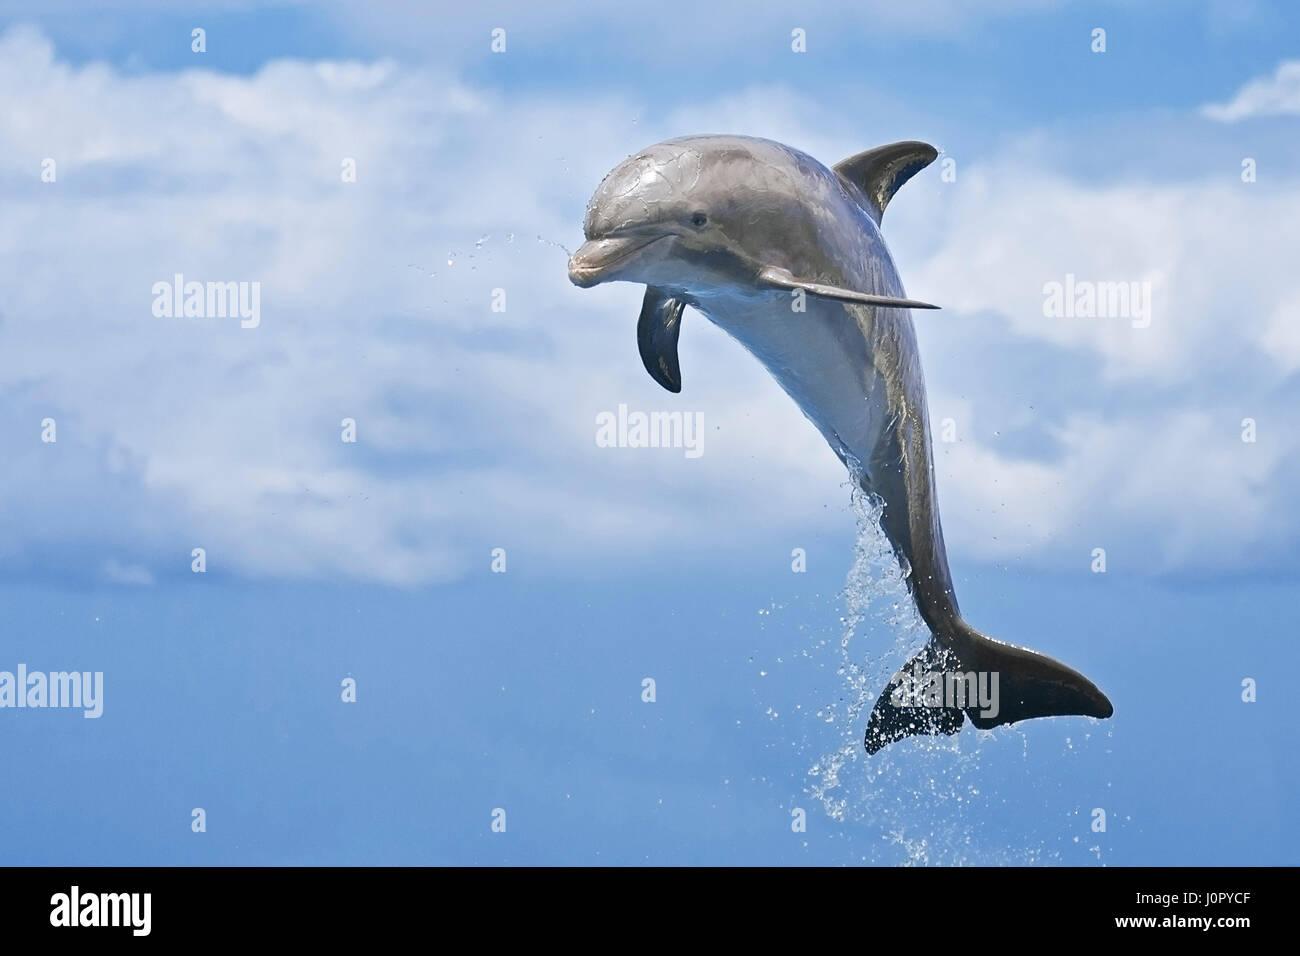 Juvenile Bottlenose Dolphin, Tursiops truncatus, Caribbean, Bahamas - Stock Image